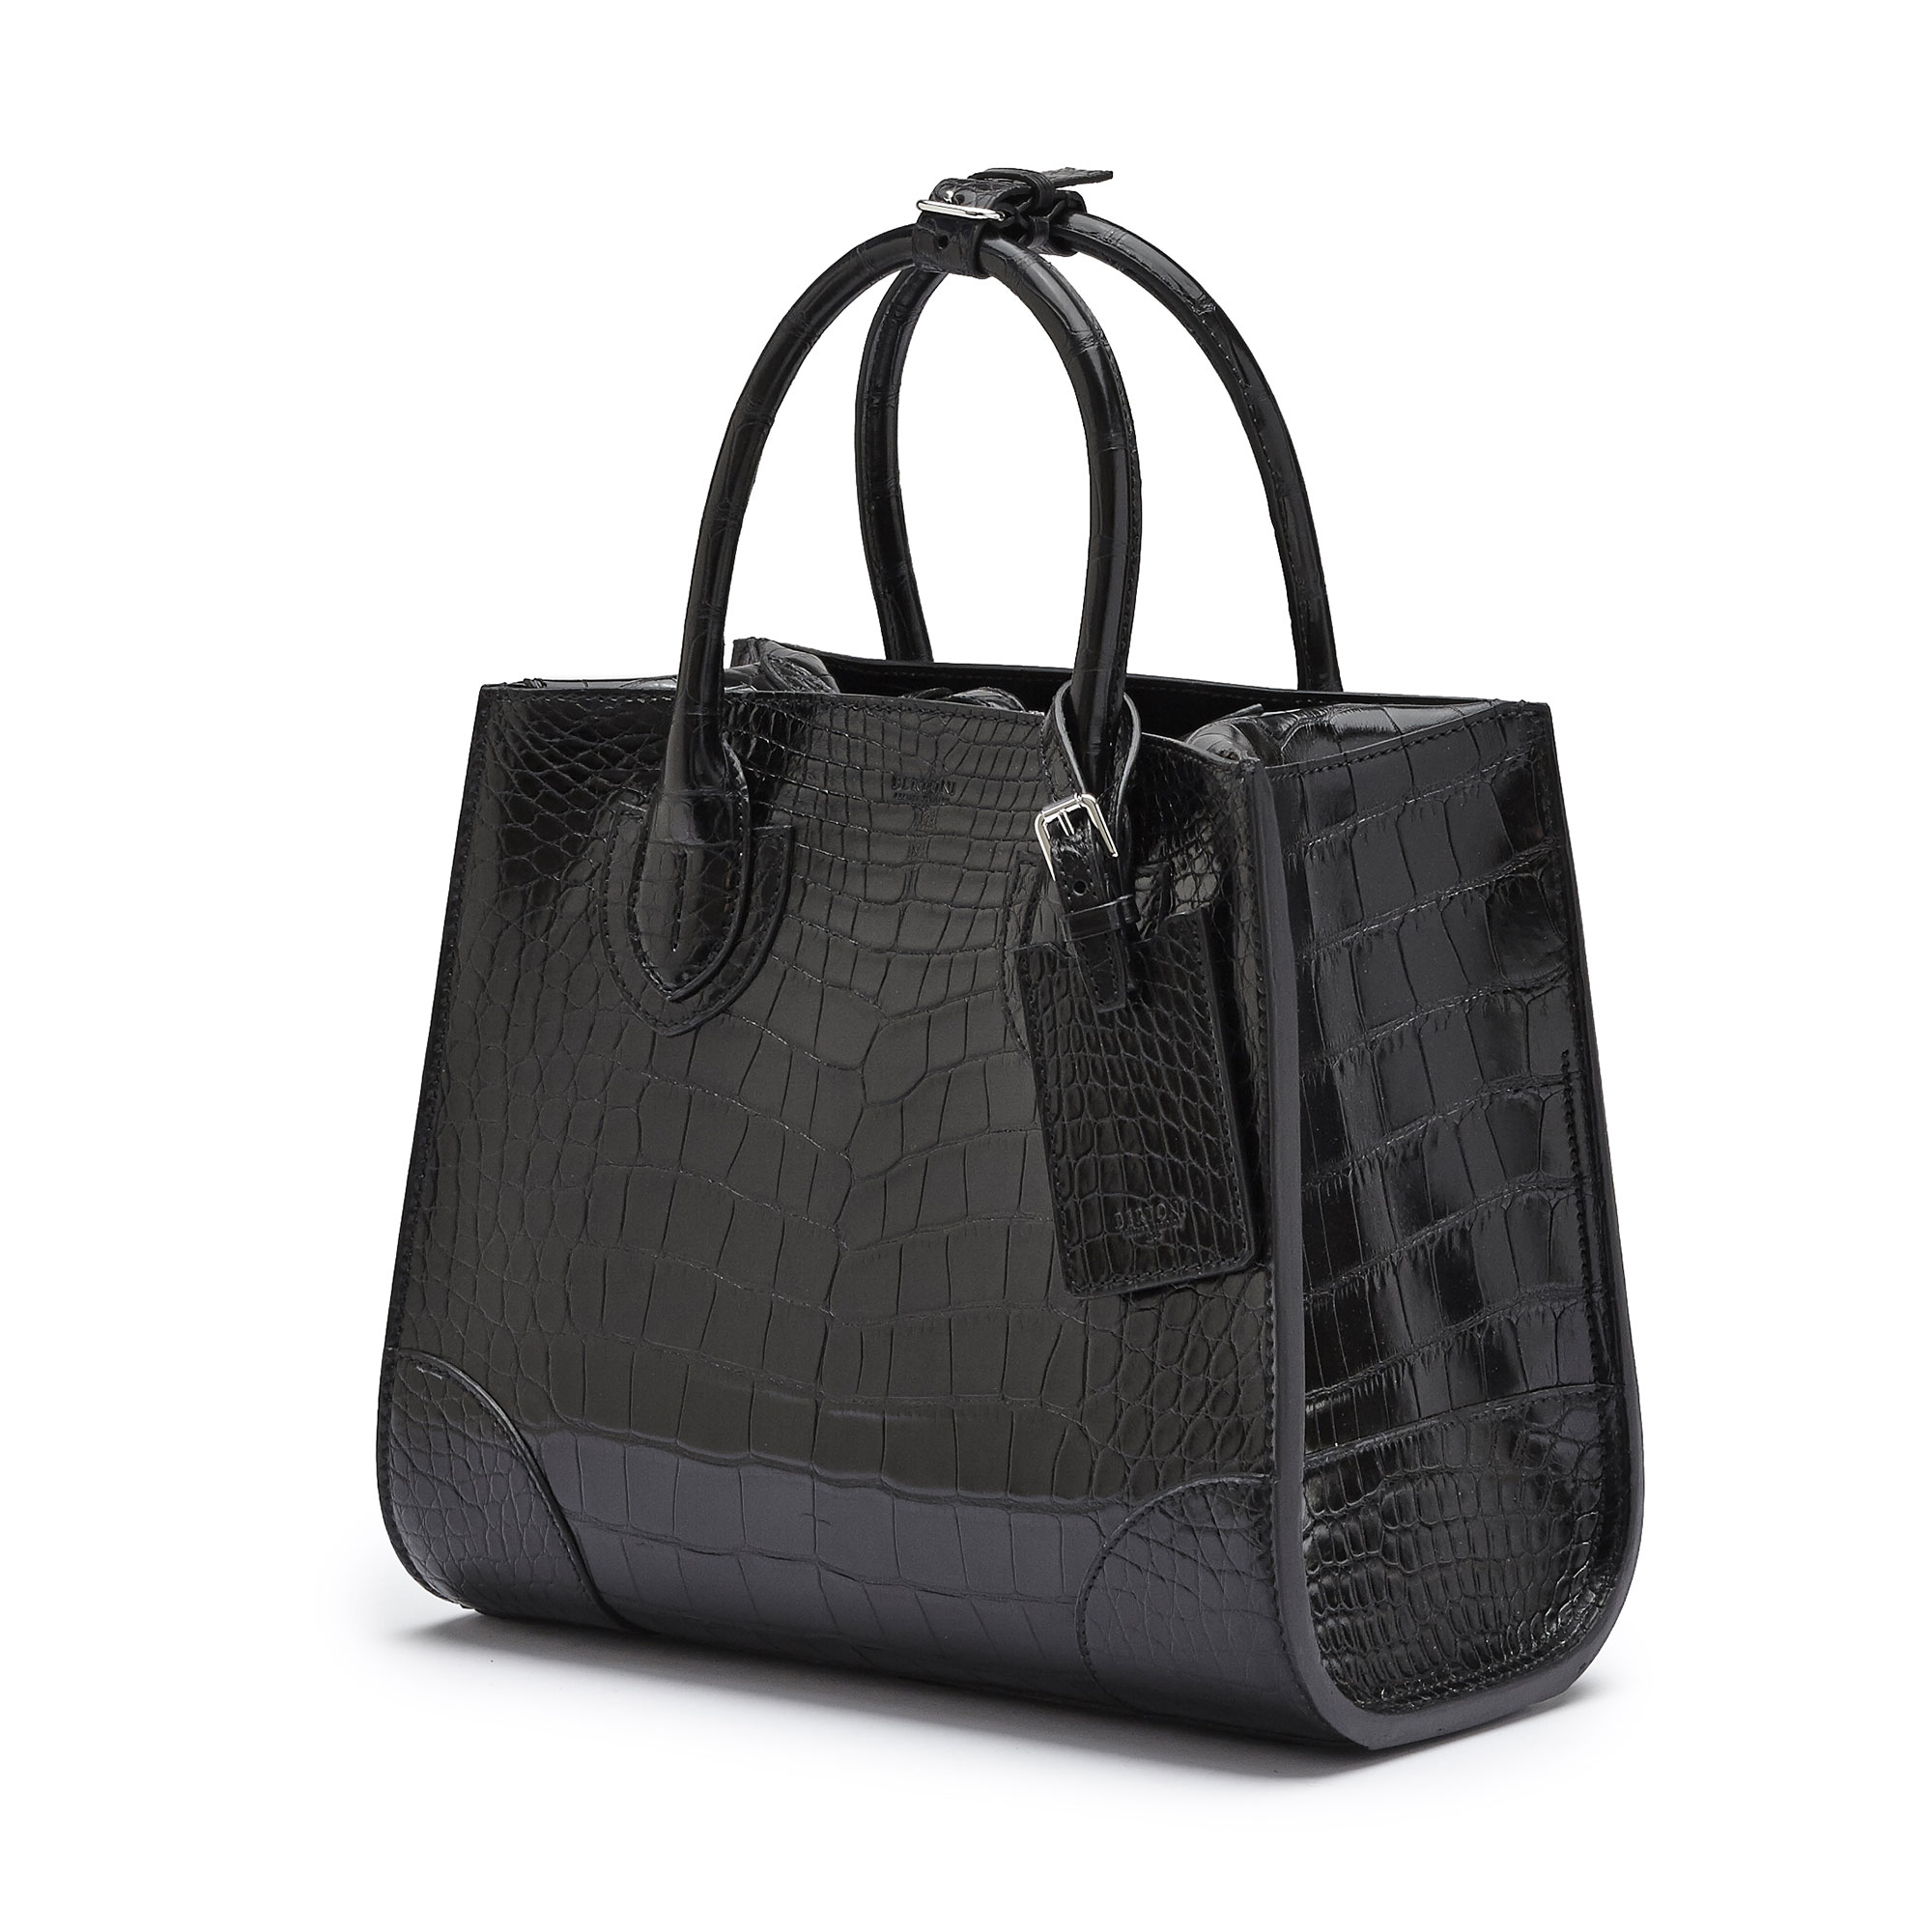 The black alligator Darcy medium bag by Bertoni 1949 03